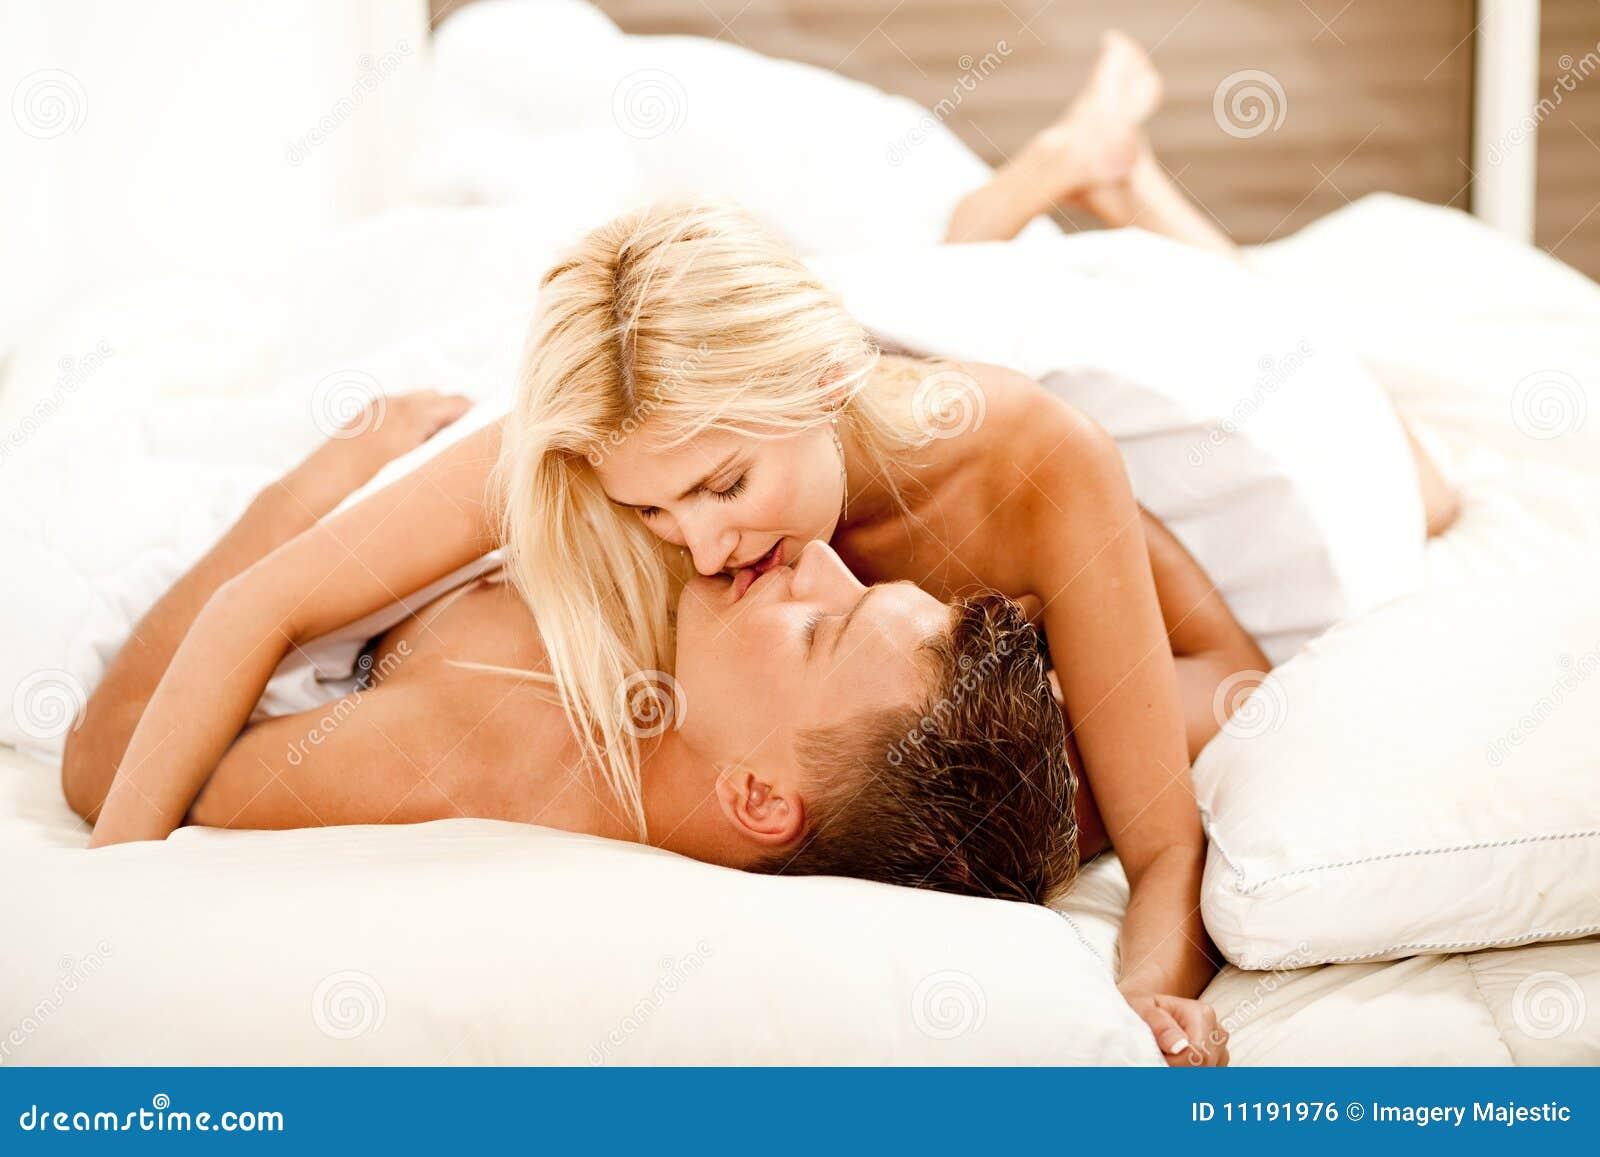 video qwqnc couple make love